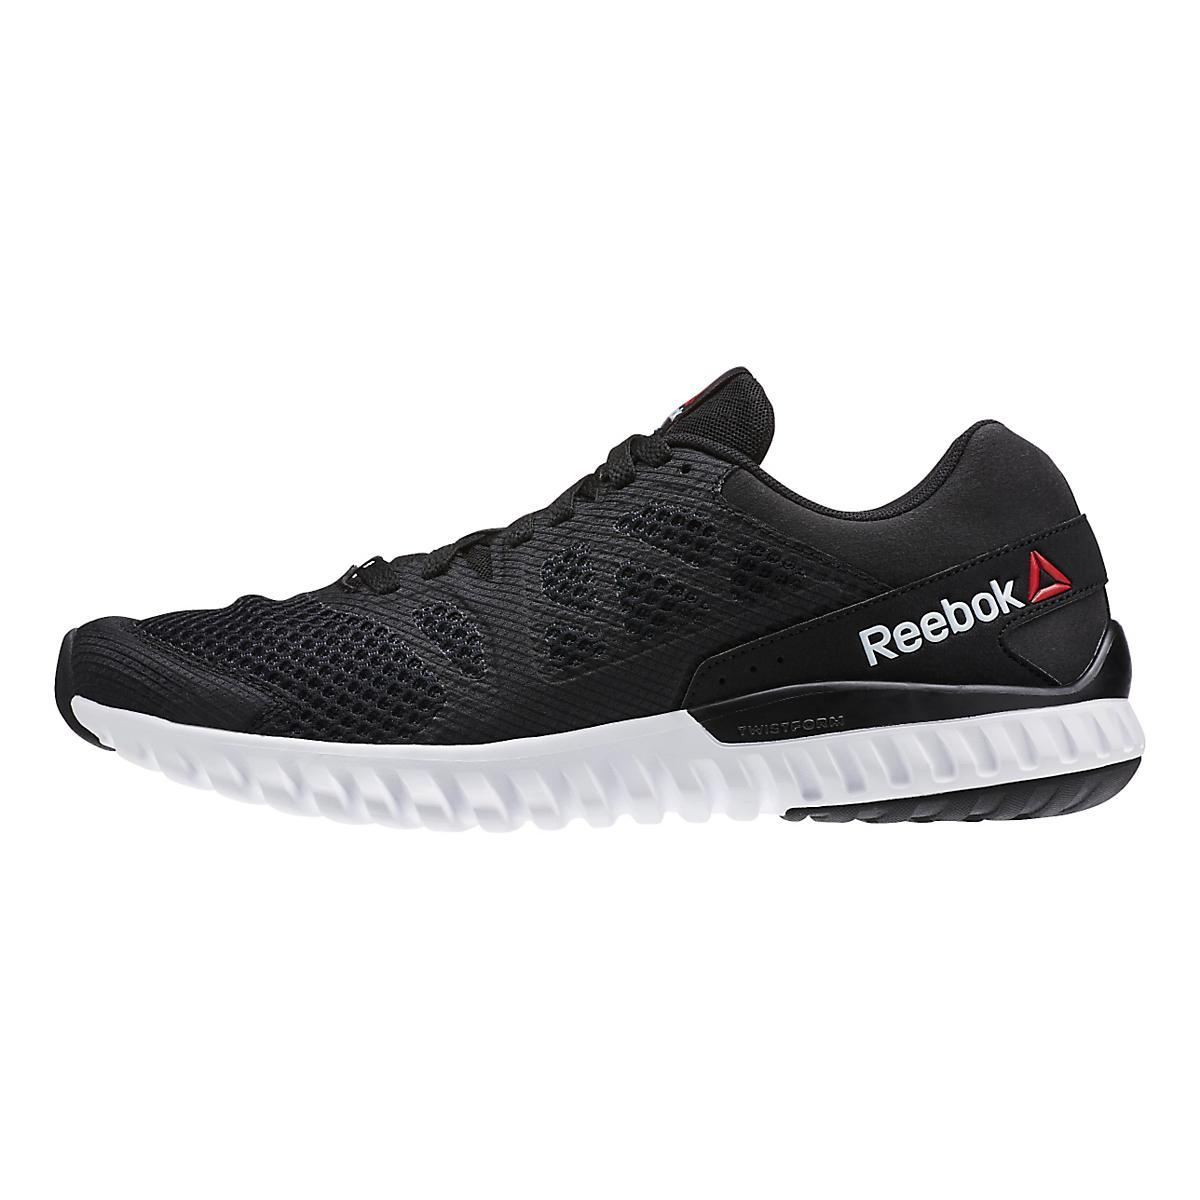 f788917aa91 Mens Reebok Twistform Blaze 2.0 MTM Running Shoe at Road Runner Sports